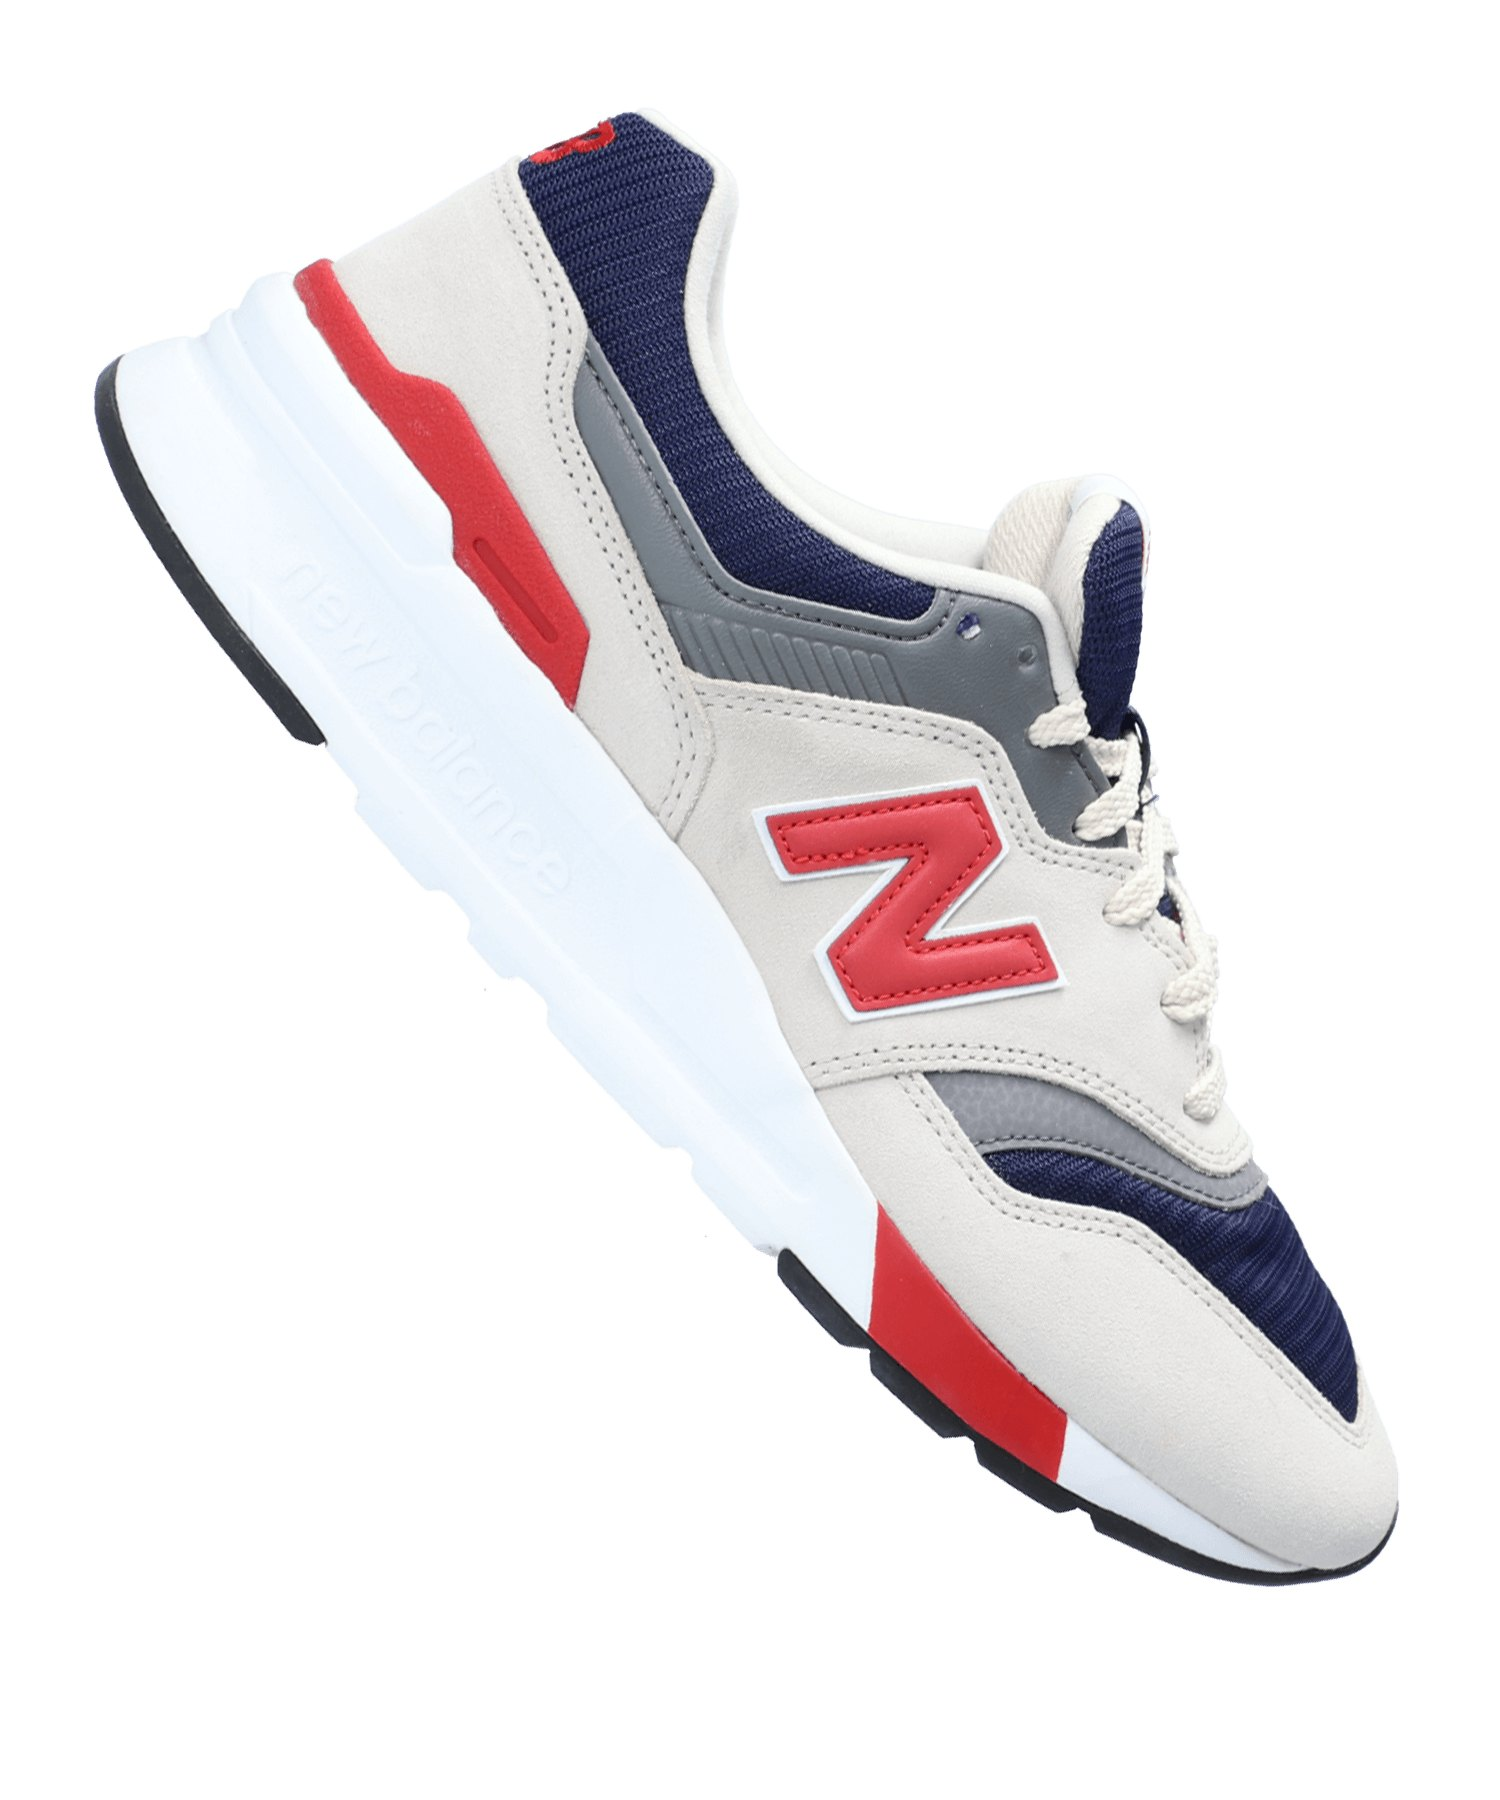 New Balance CM997HEY Sneaker Grau F11 - grau